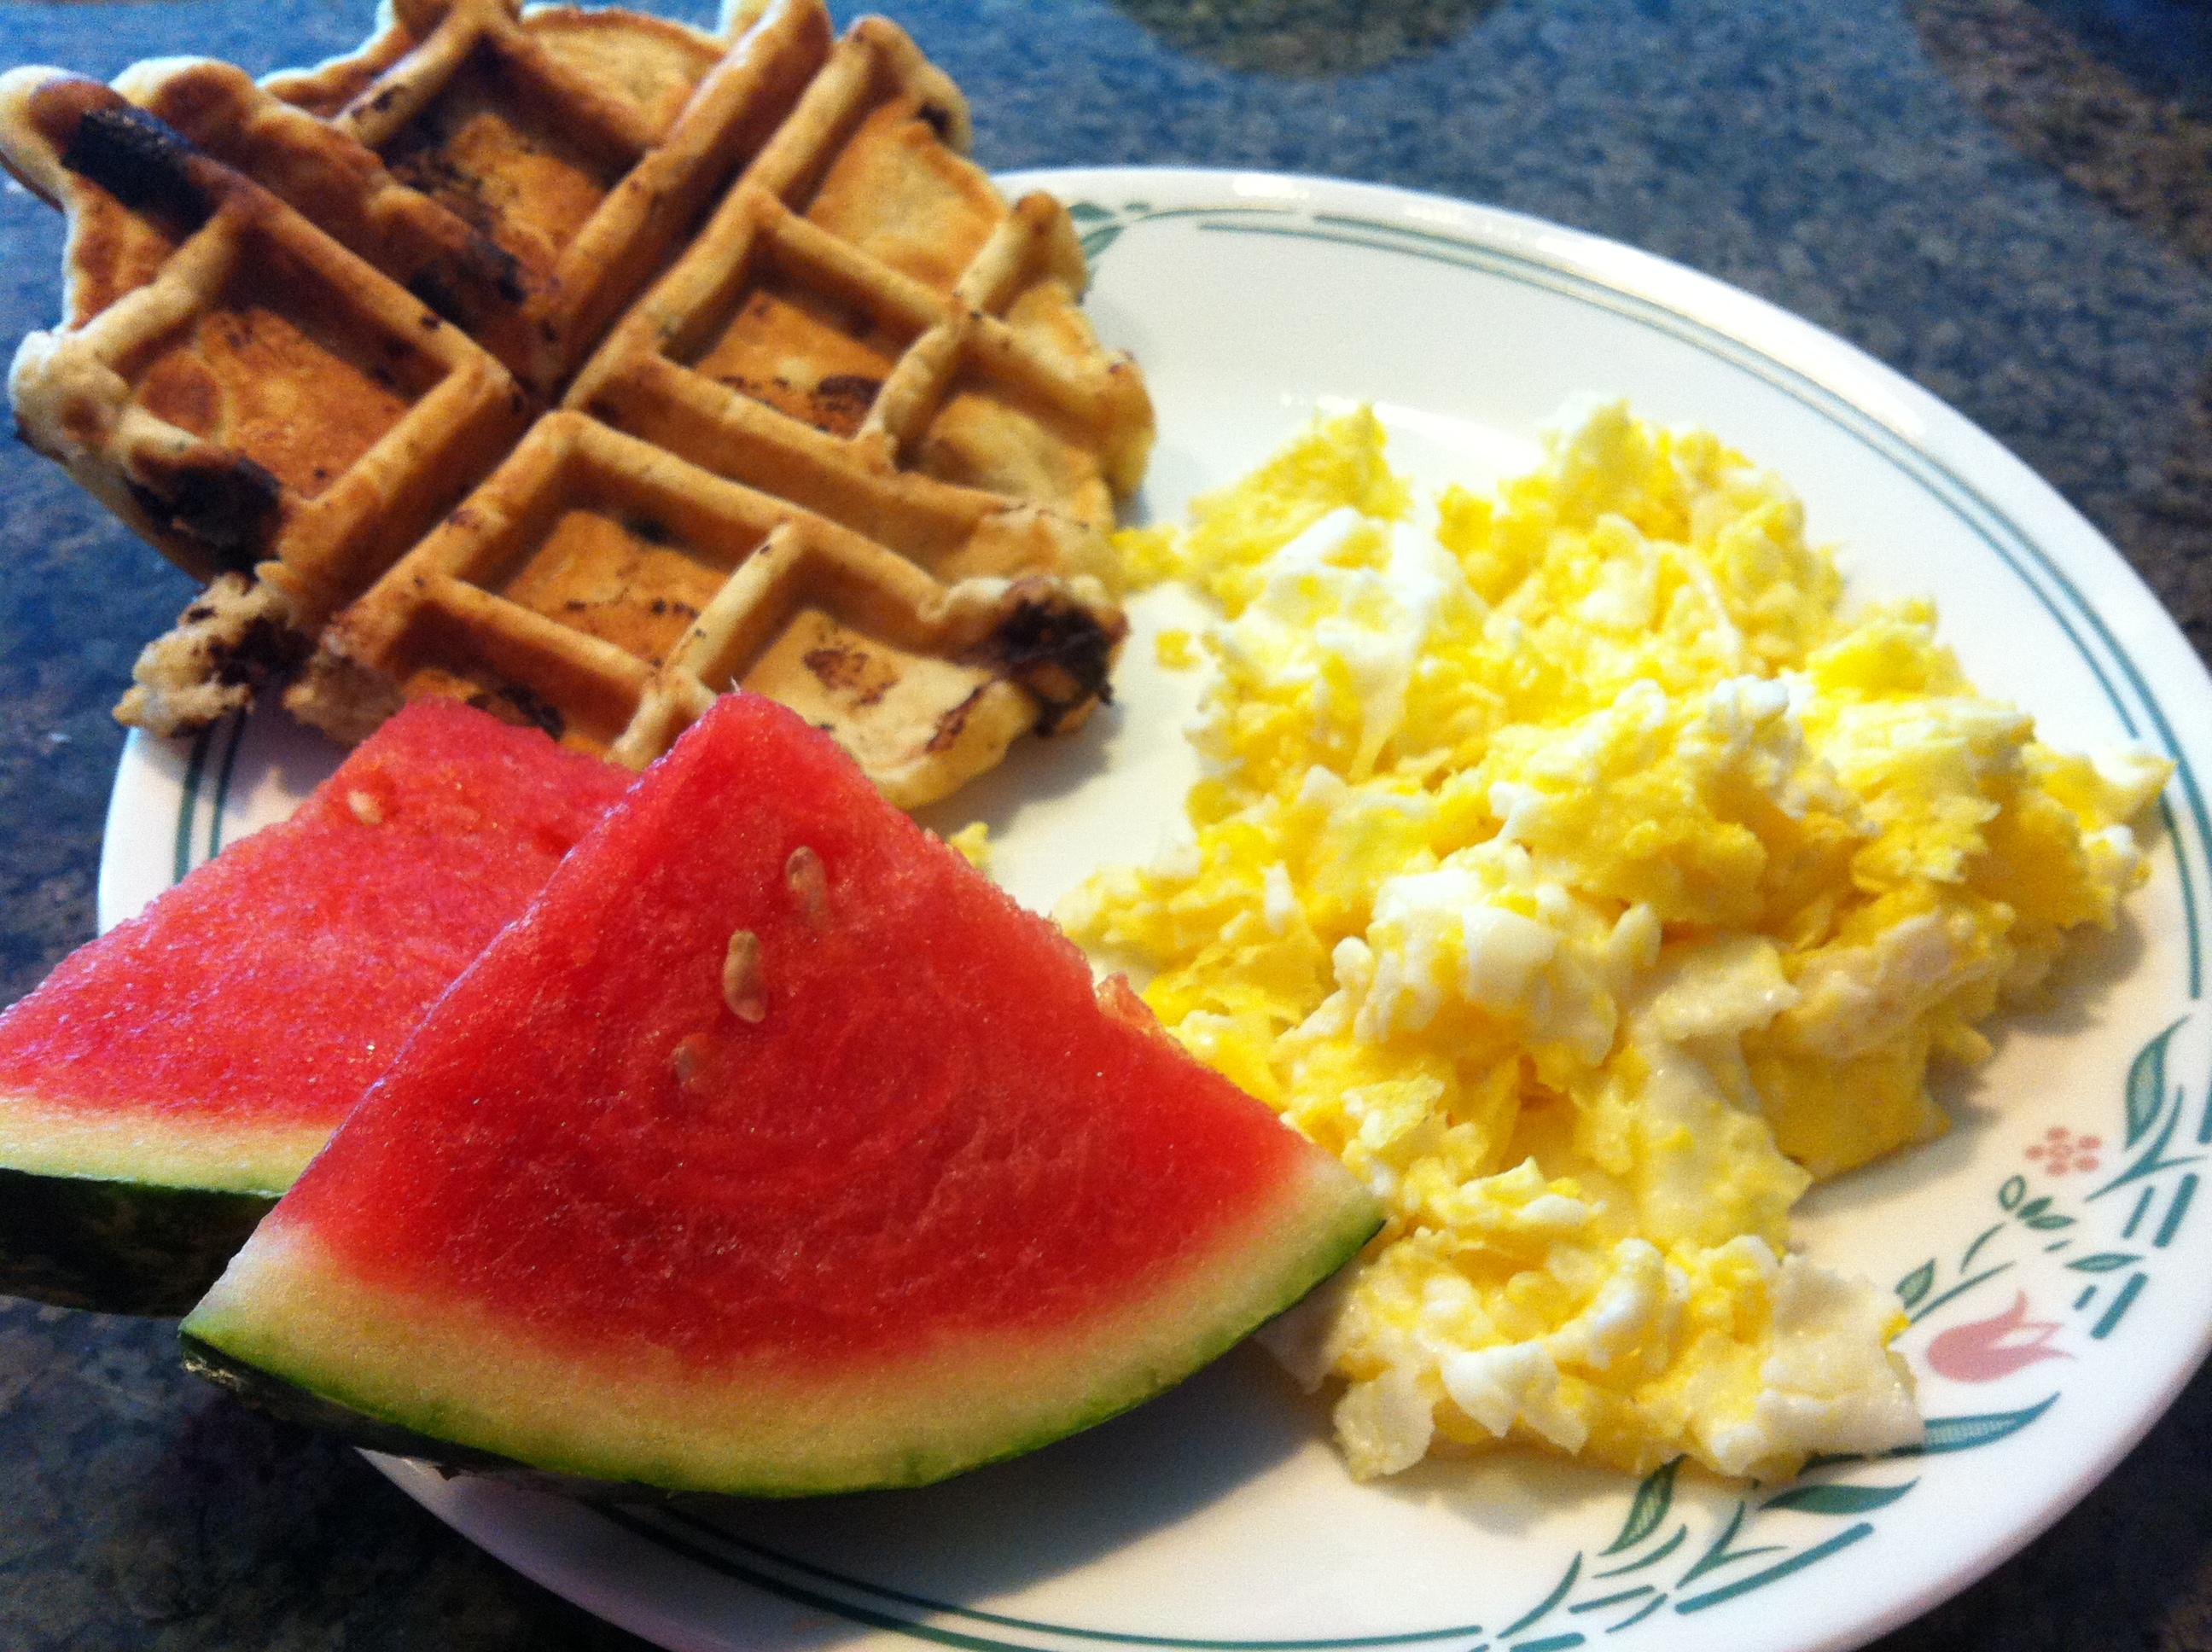 Waffles, eggs and fruit for dinner